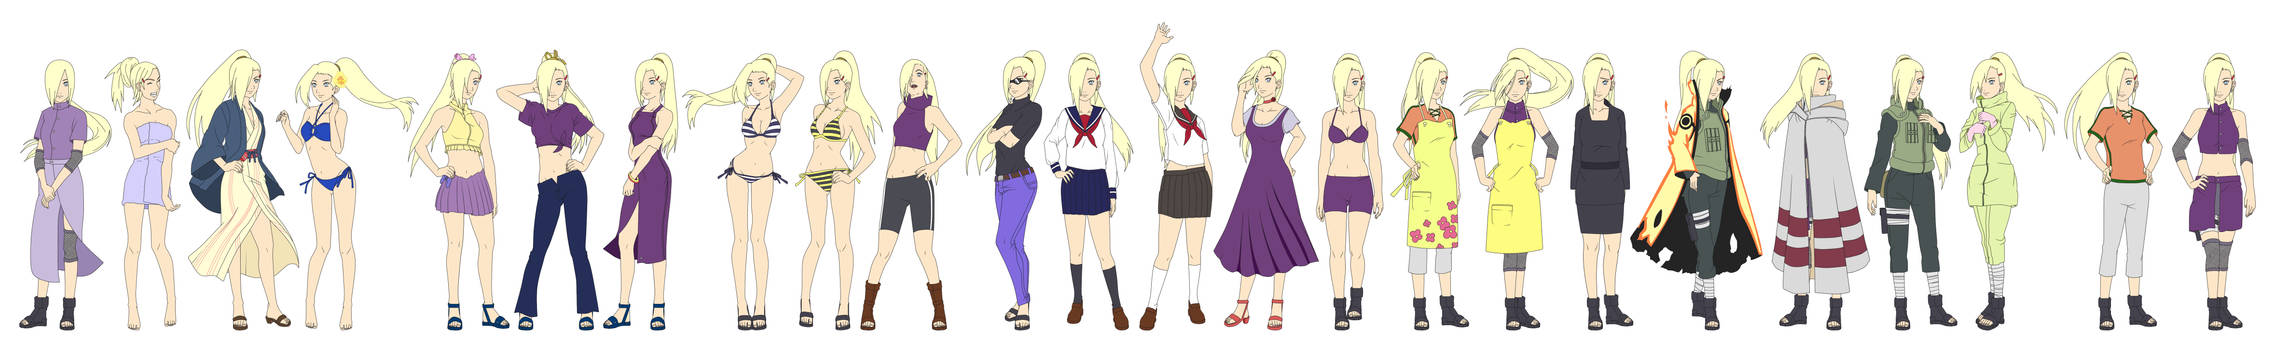 Ino Yamanaka Outfit Color NARUTO SHIPPUUDEN